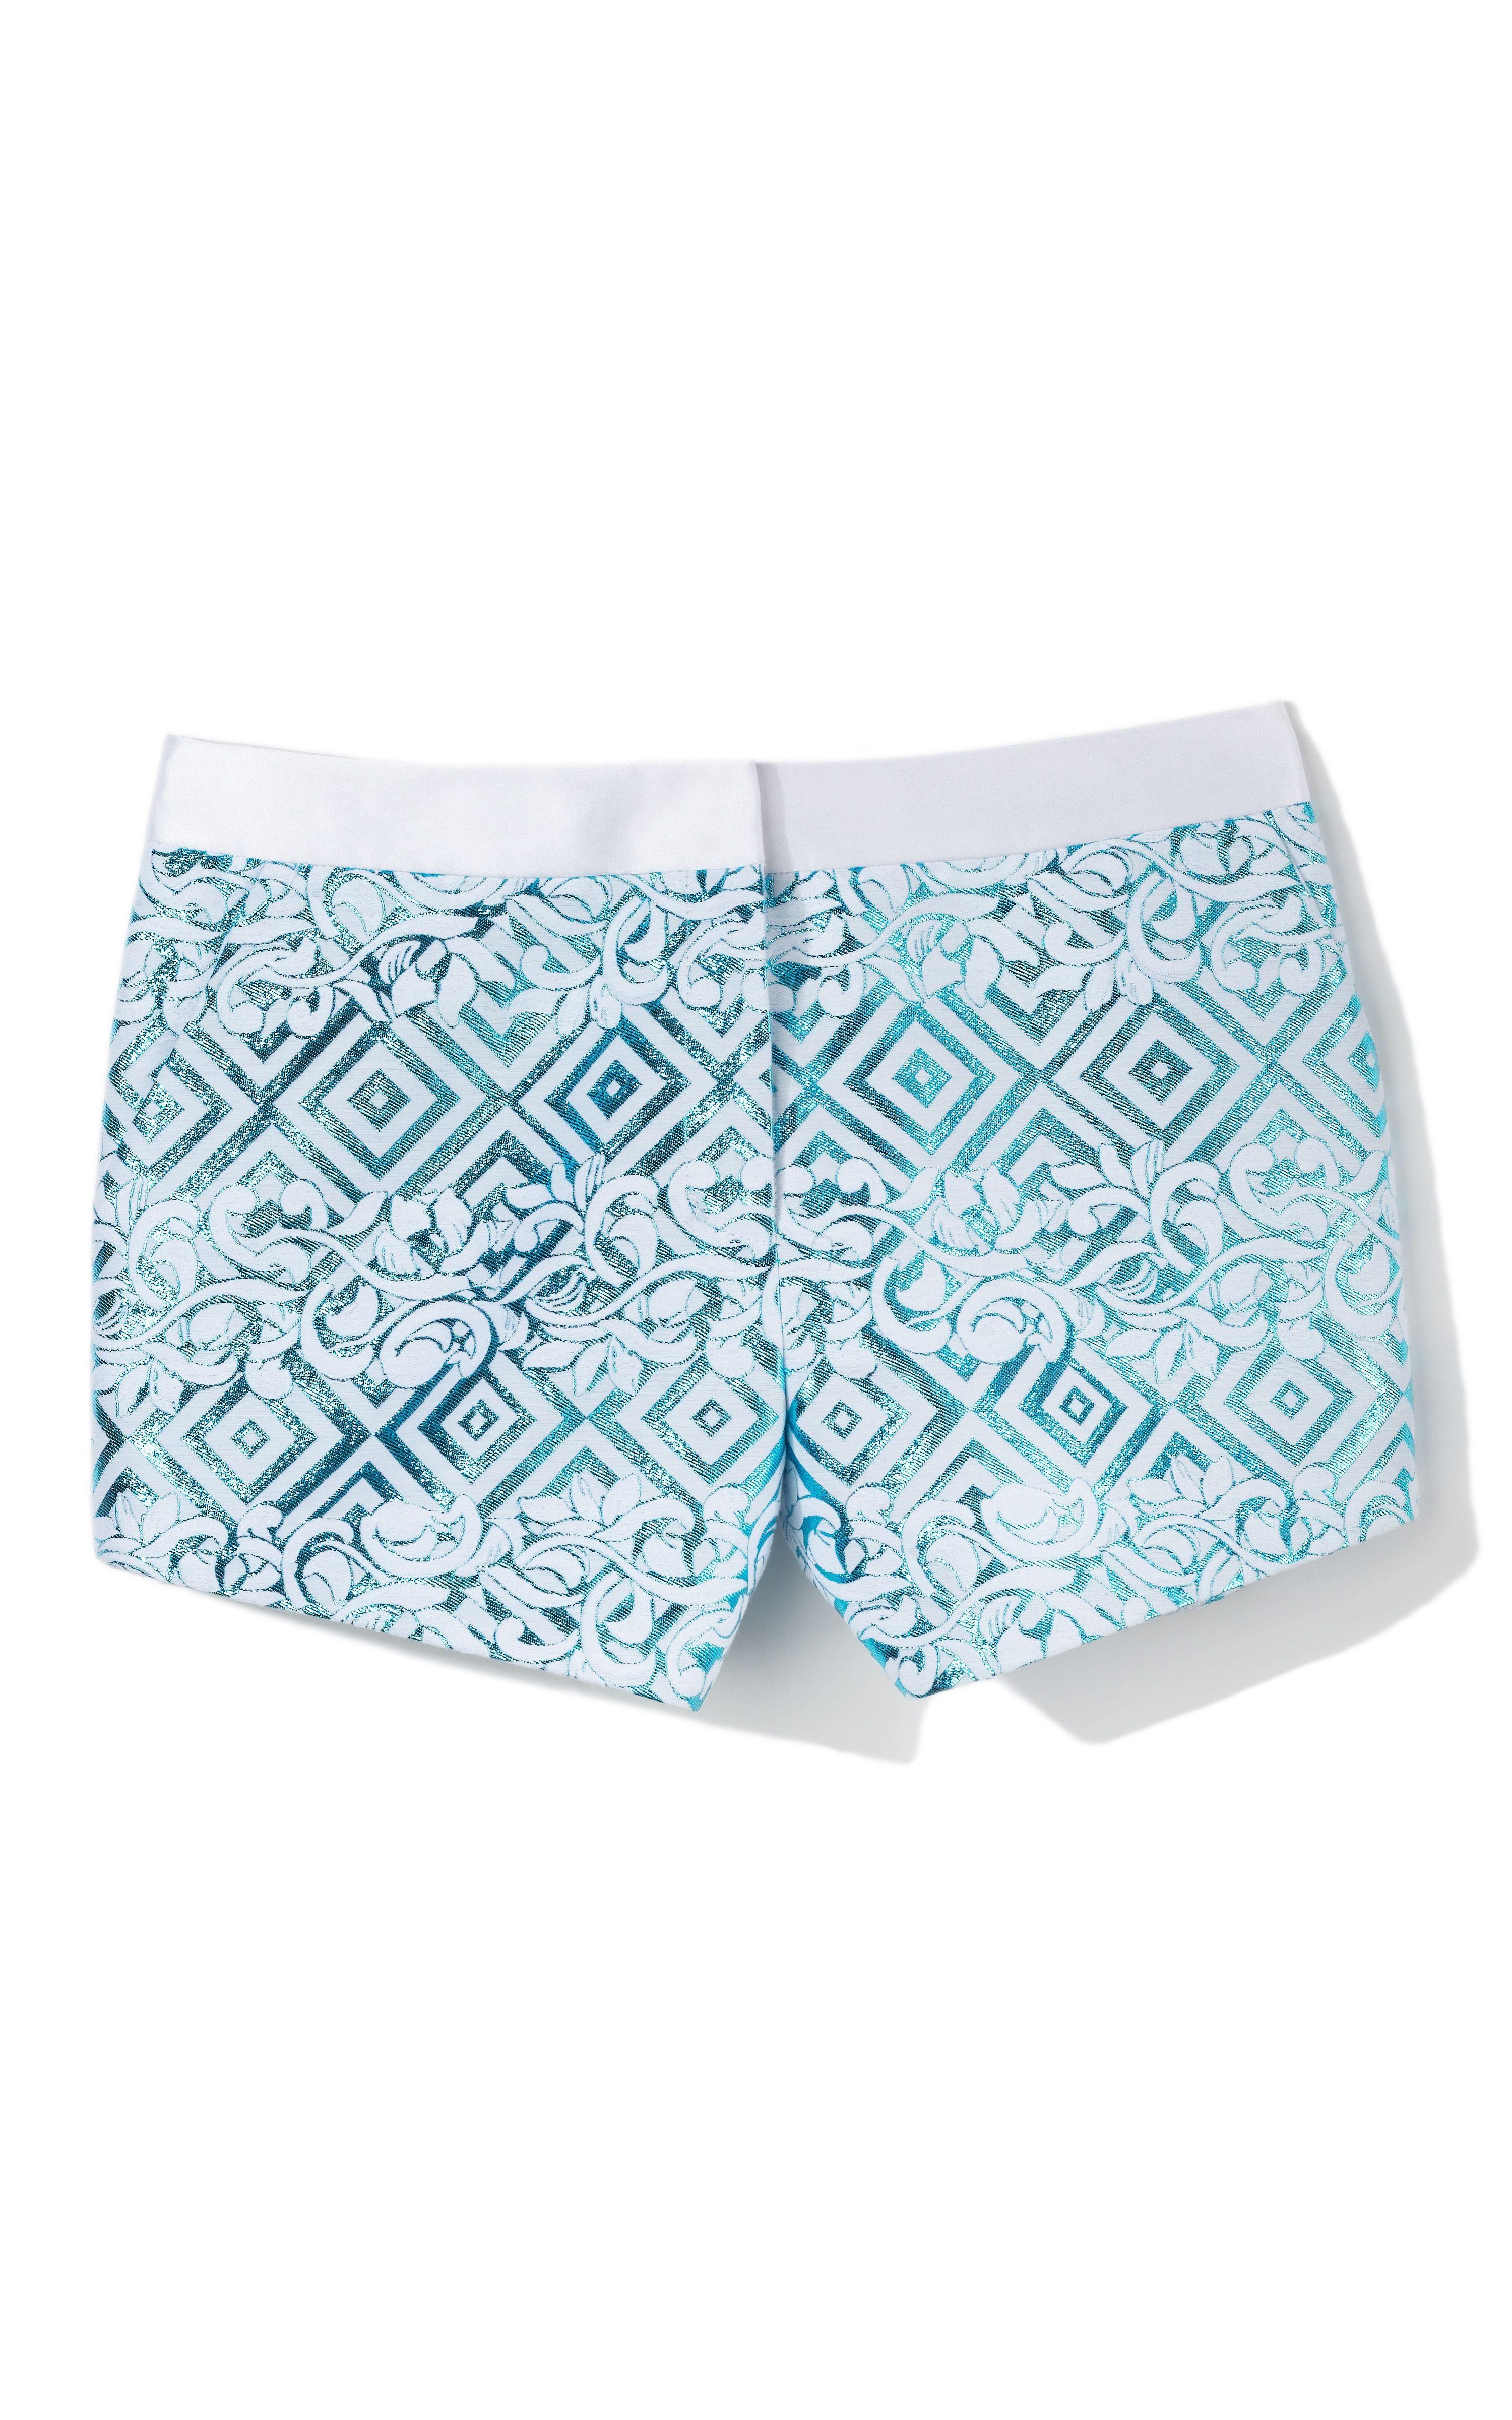 Prabal Gurung Metallic Track Shorts: I need these for outdoor season #sweet